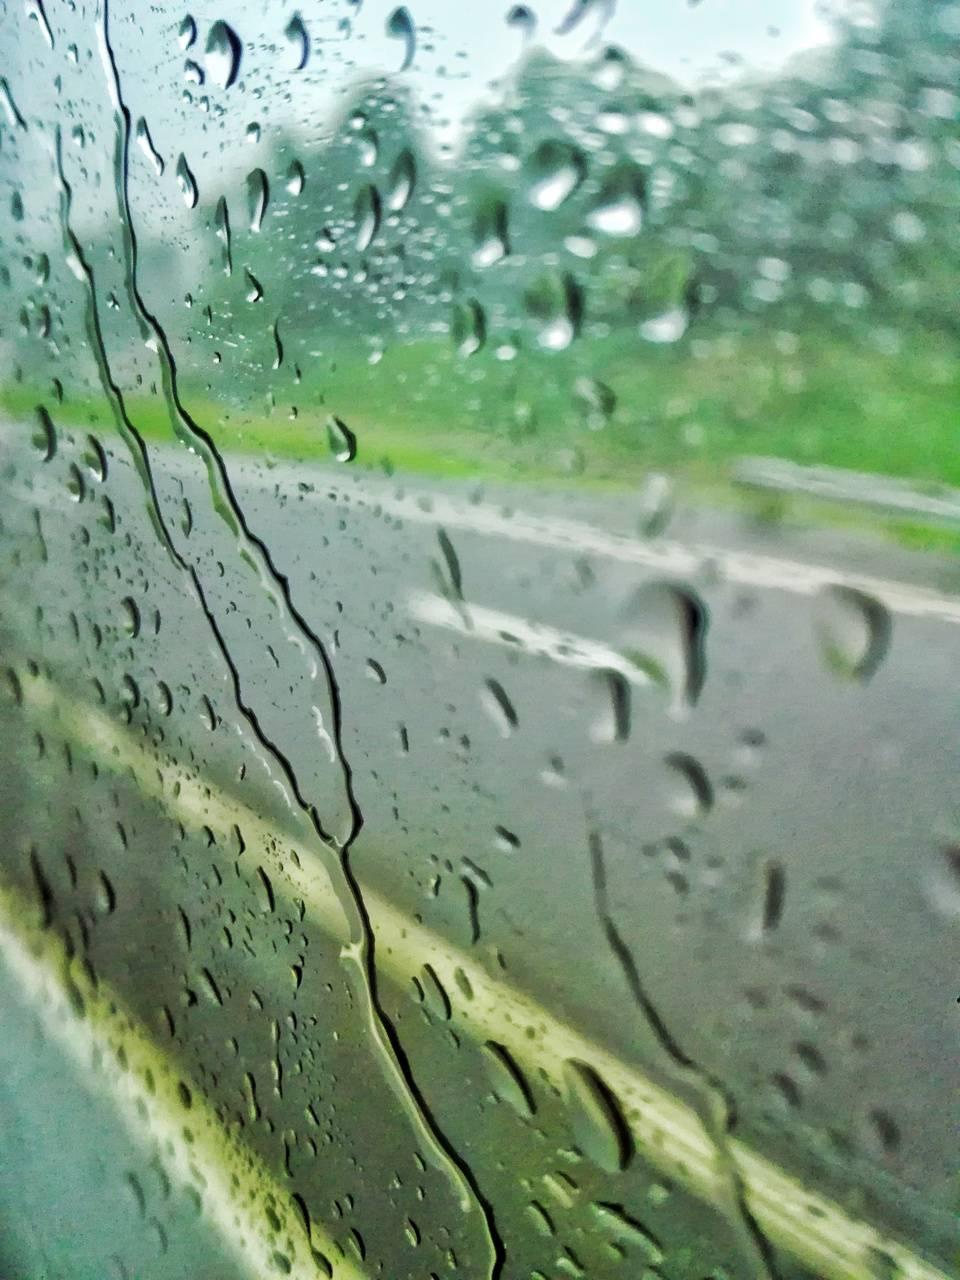 Glassy water drops